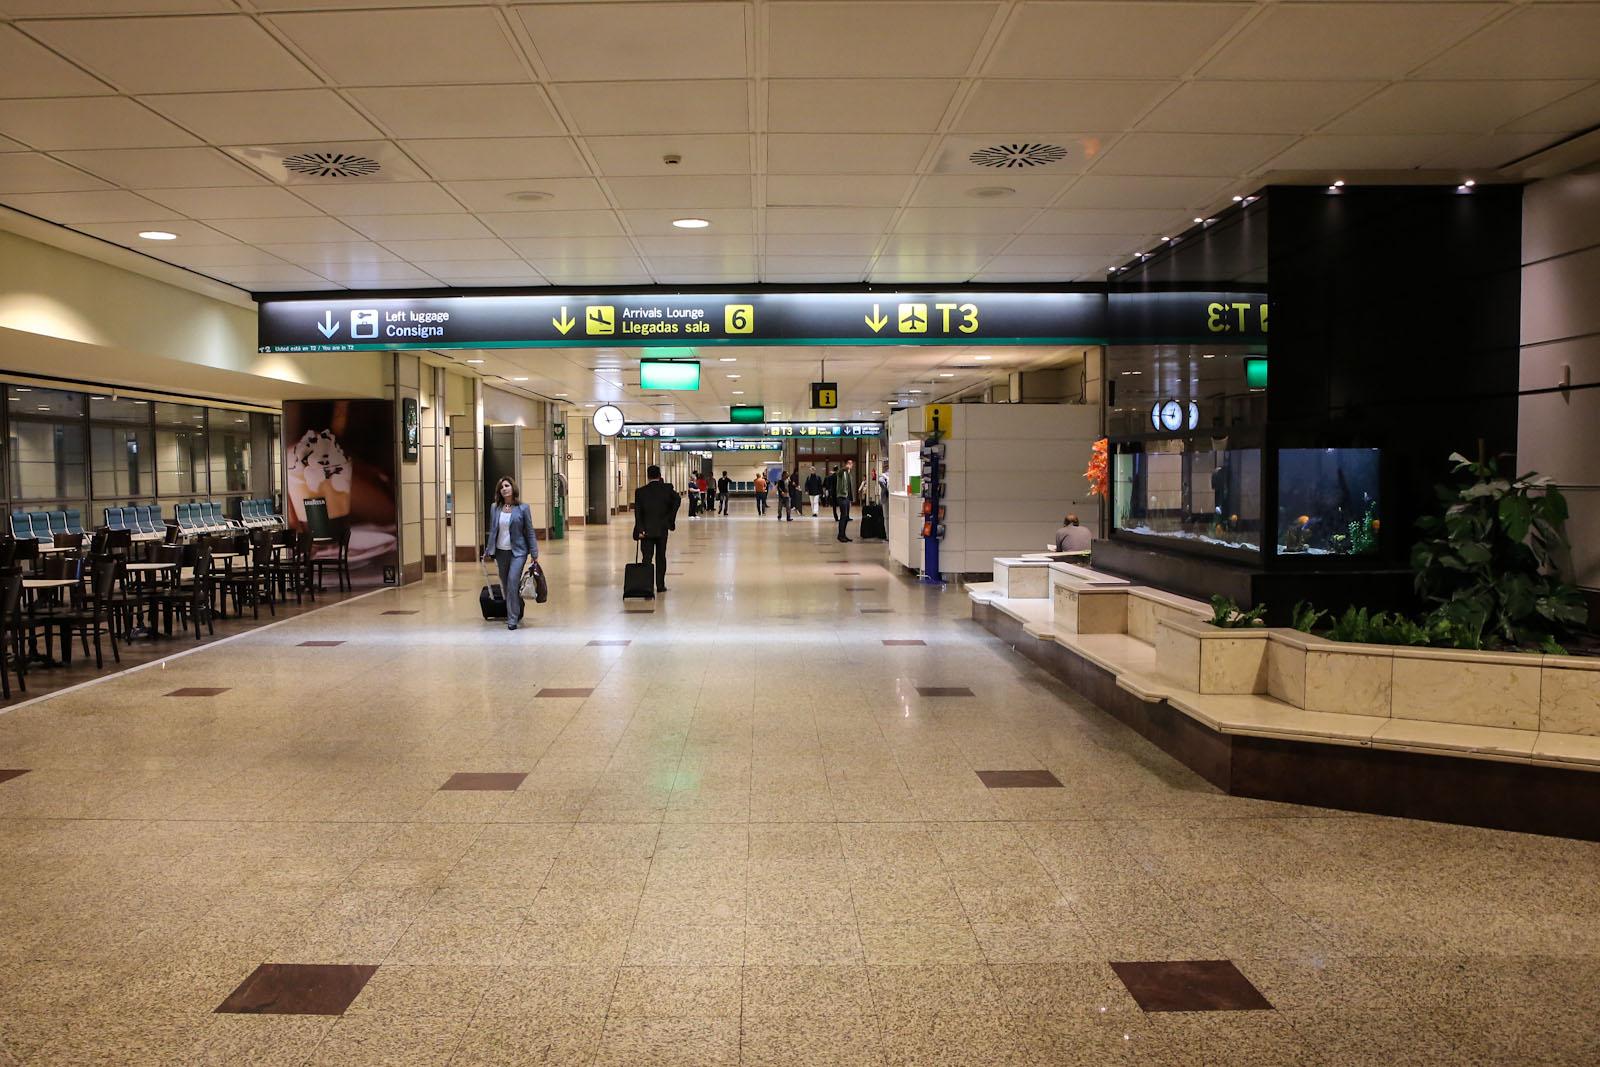 В зоне выдачи багажа в терминале Т2 аэропорта Мадрид Барахас